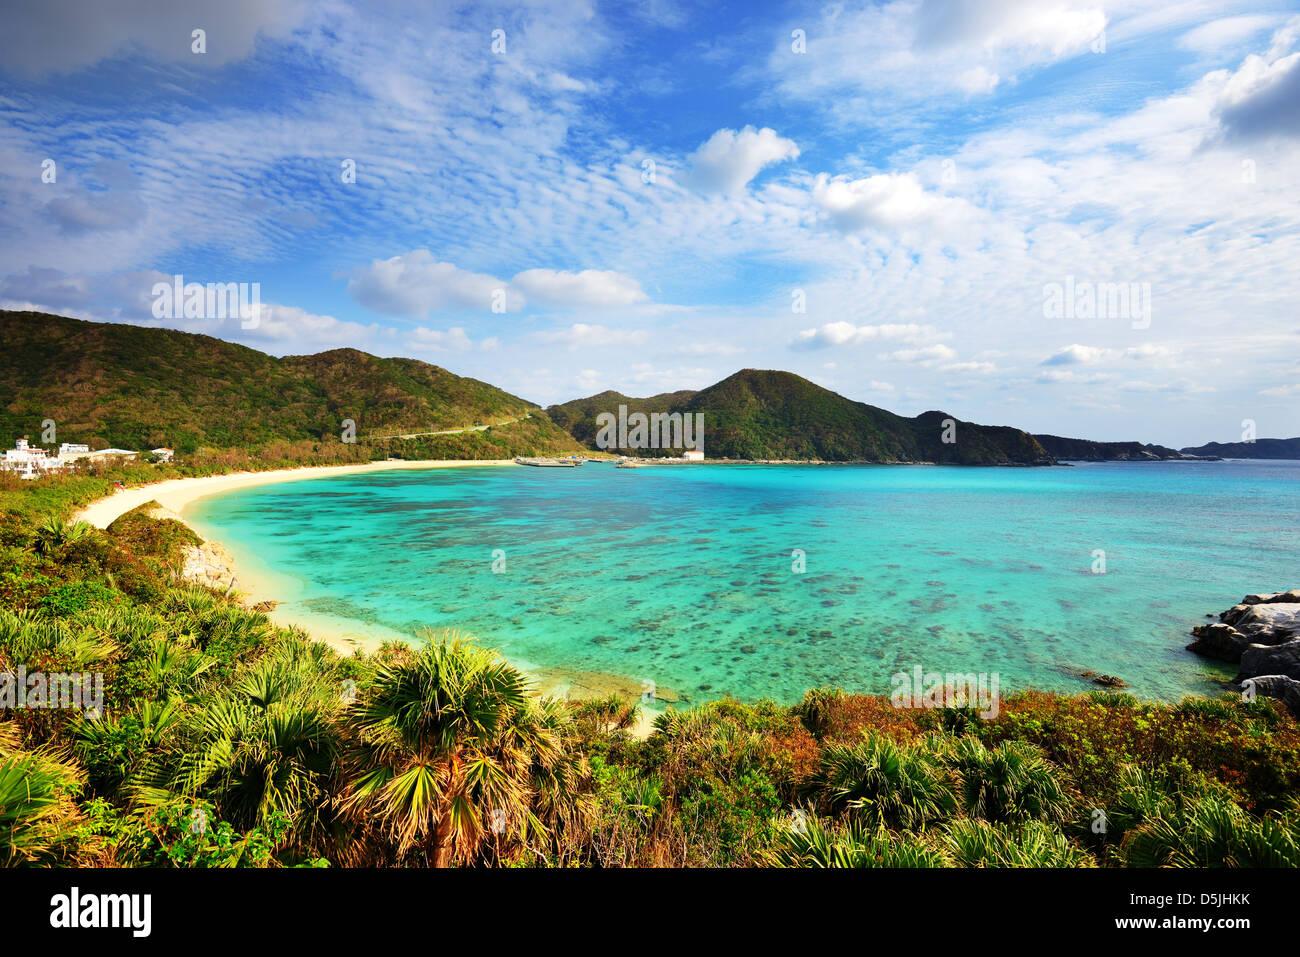 Aharen Beach en la isla de Tokashiki en Okinawa, Japón. Imagen De Stock